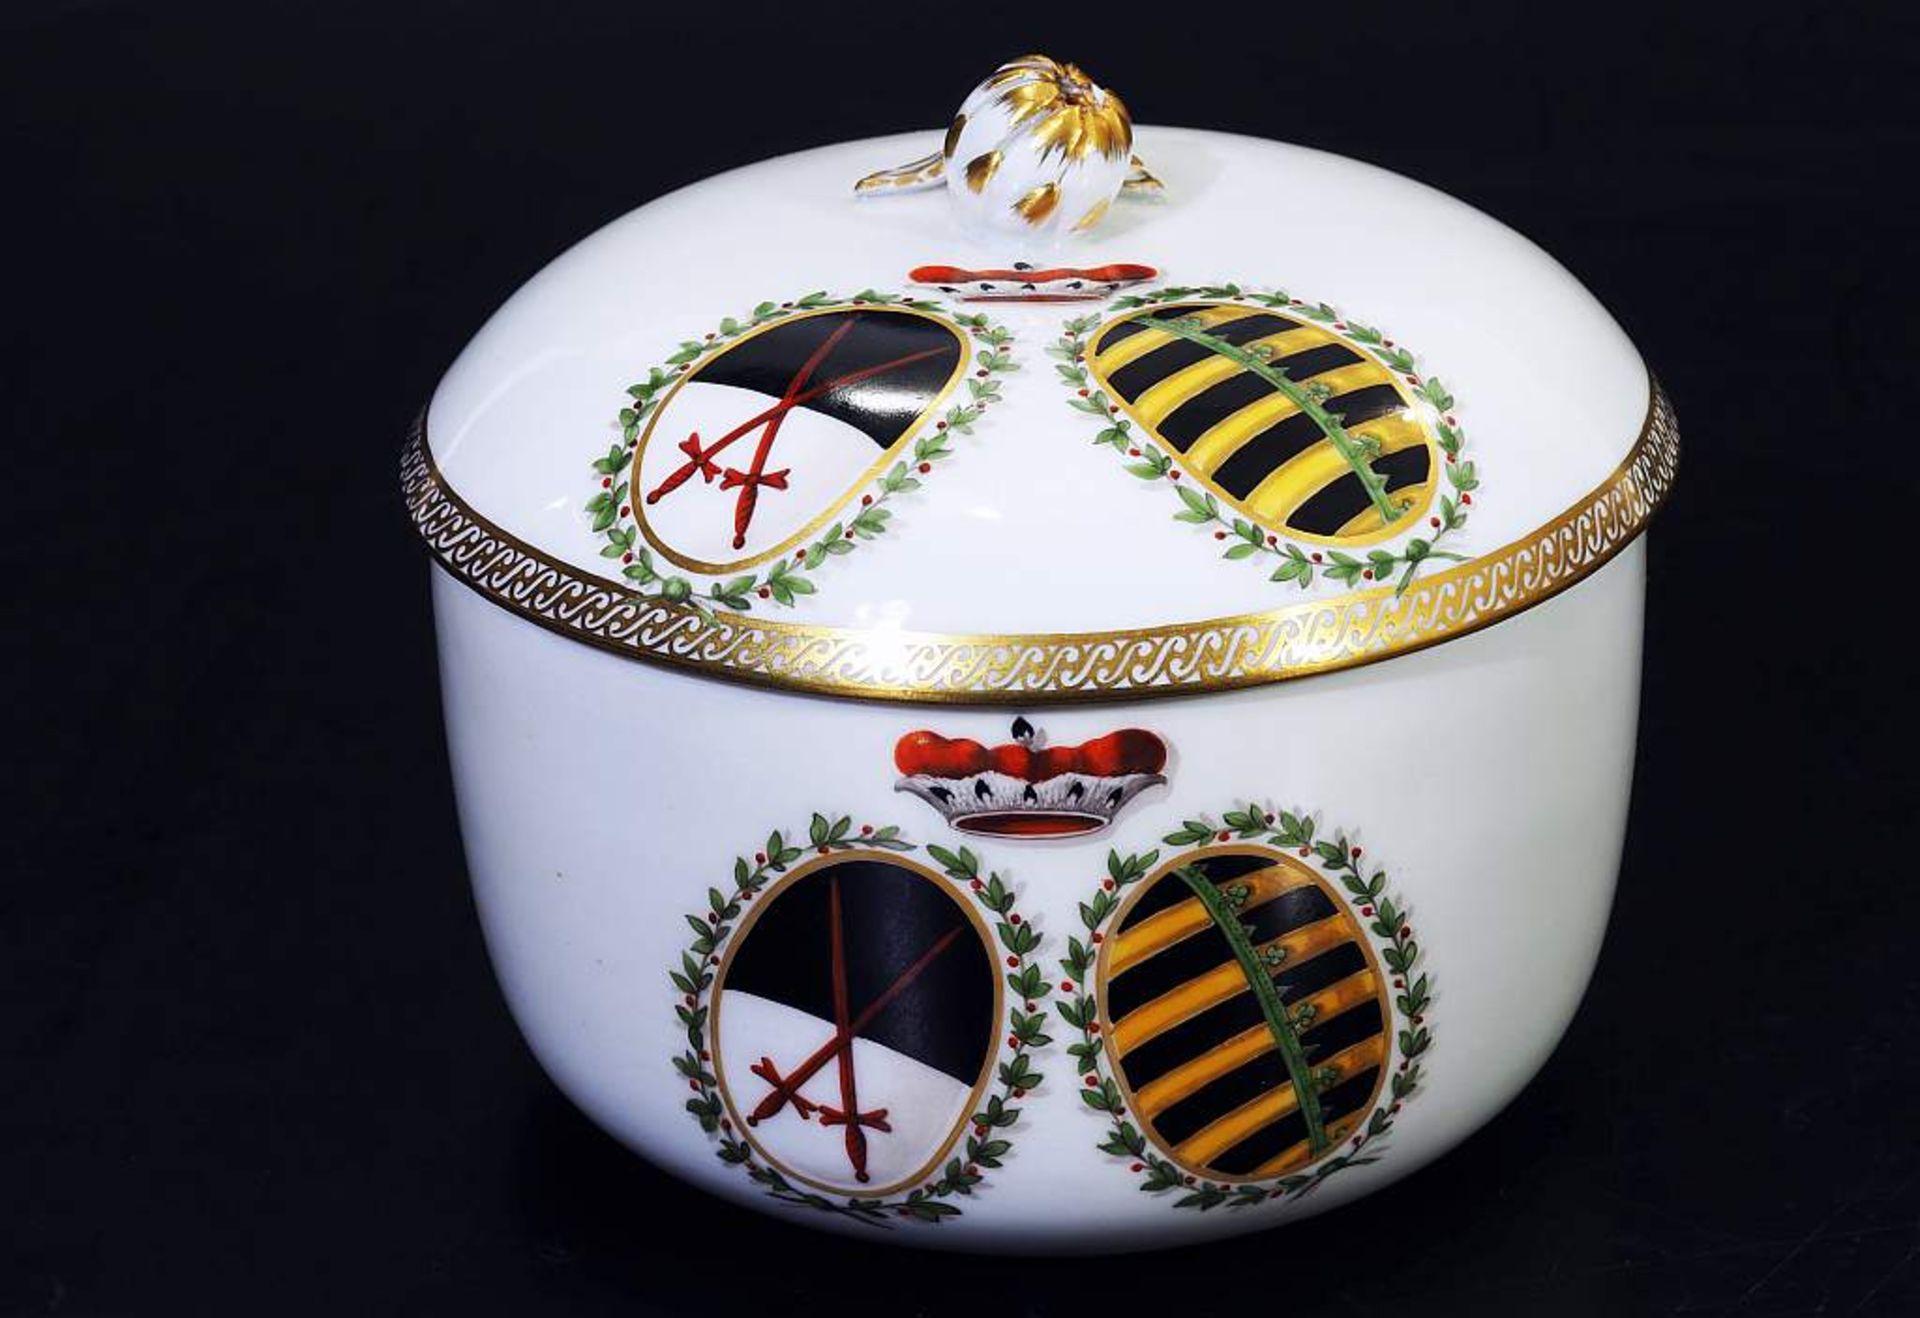 Los 40 - Marcolini Wappen-DeckeldoseMarcolini Wappen-Deckeldose. MEISSEN 1774 - 1814. Zylindrische Form,